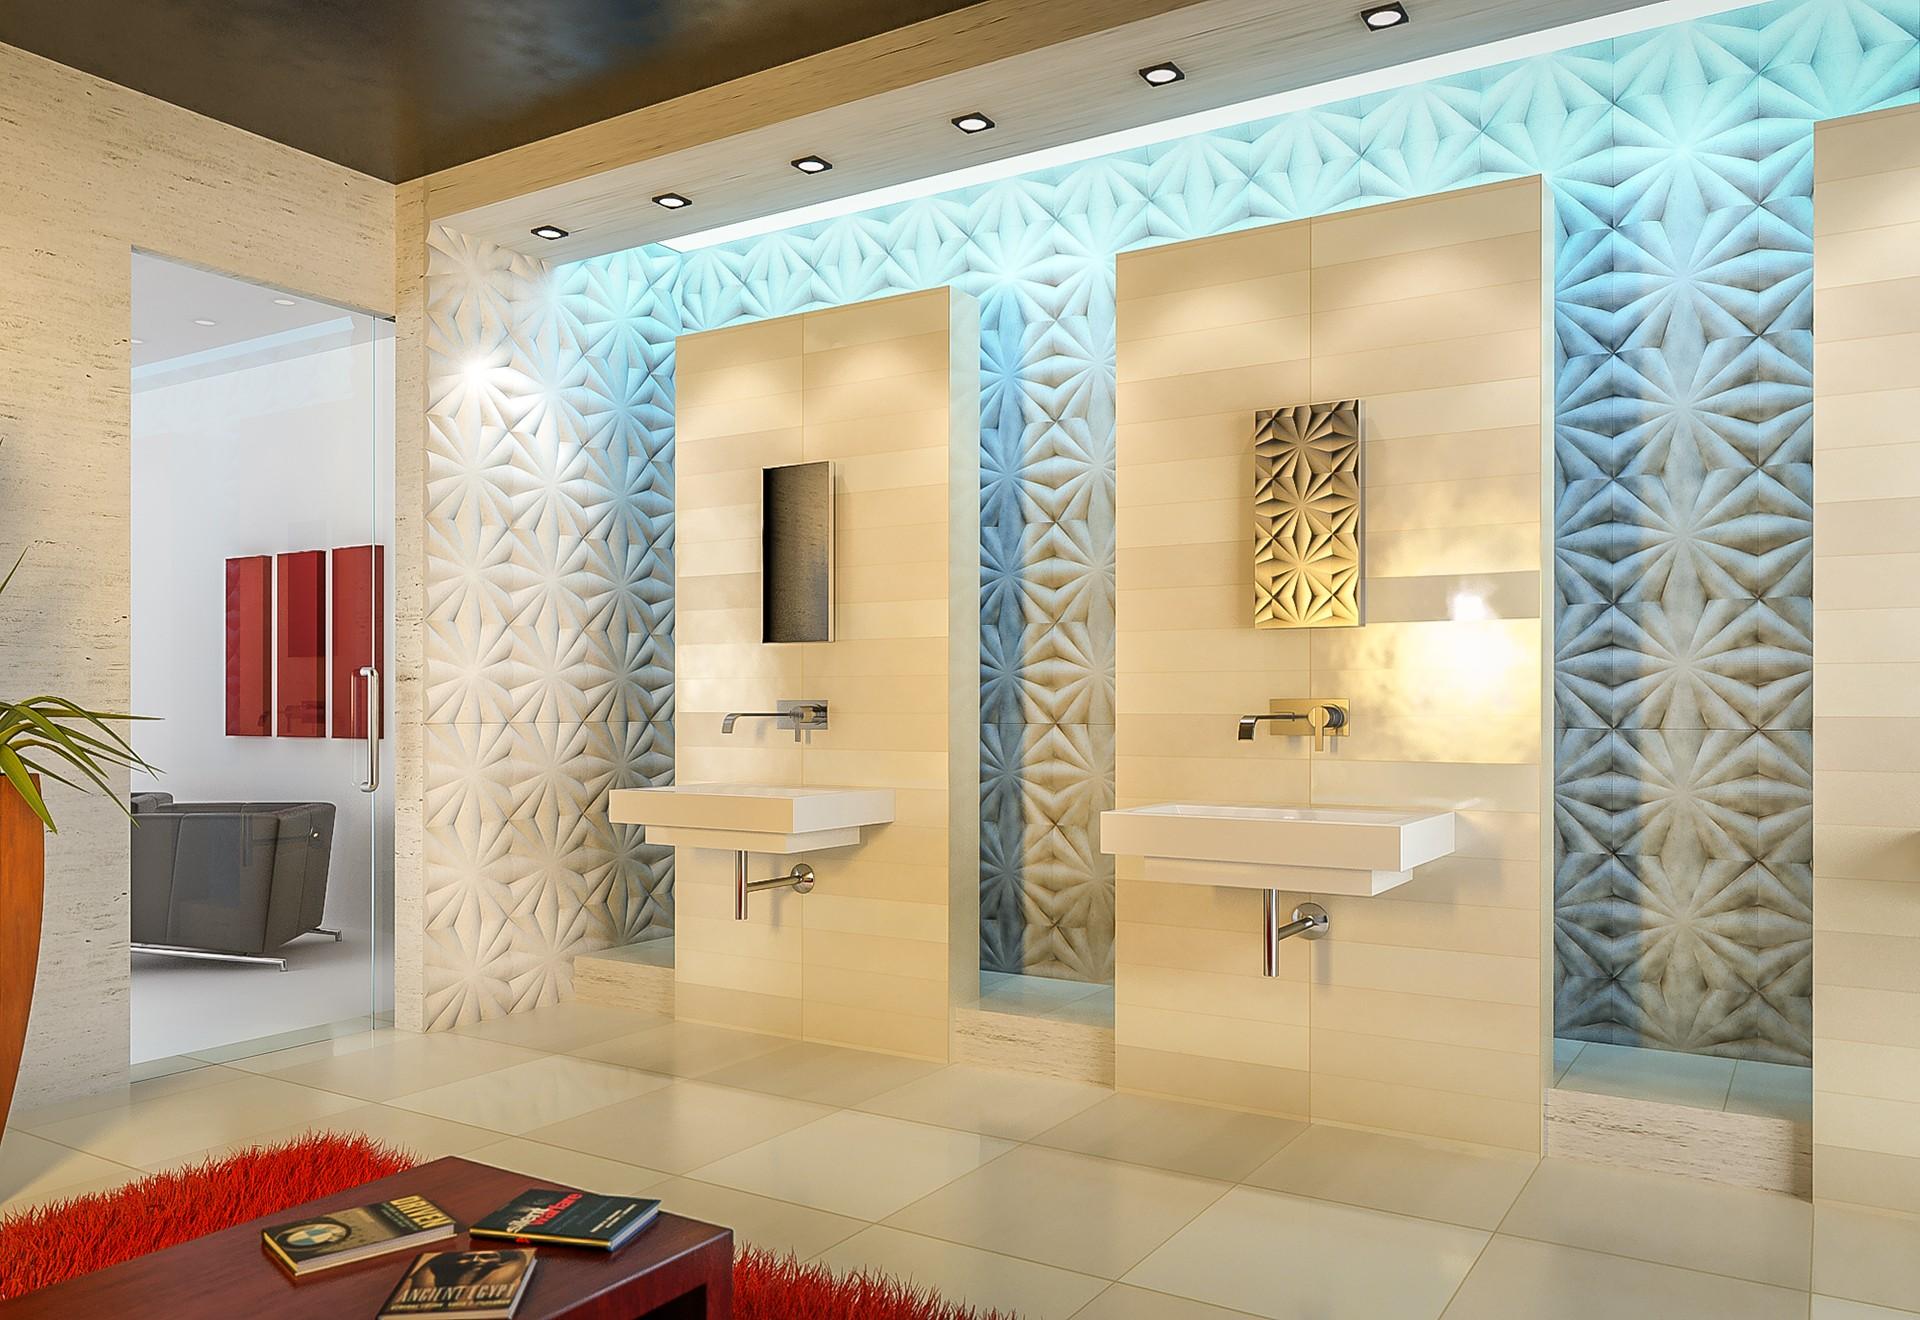 3D work limestone